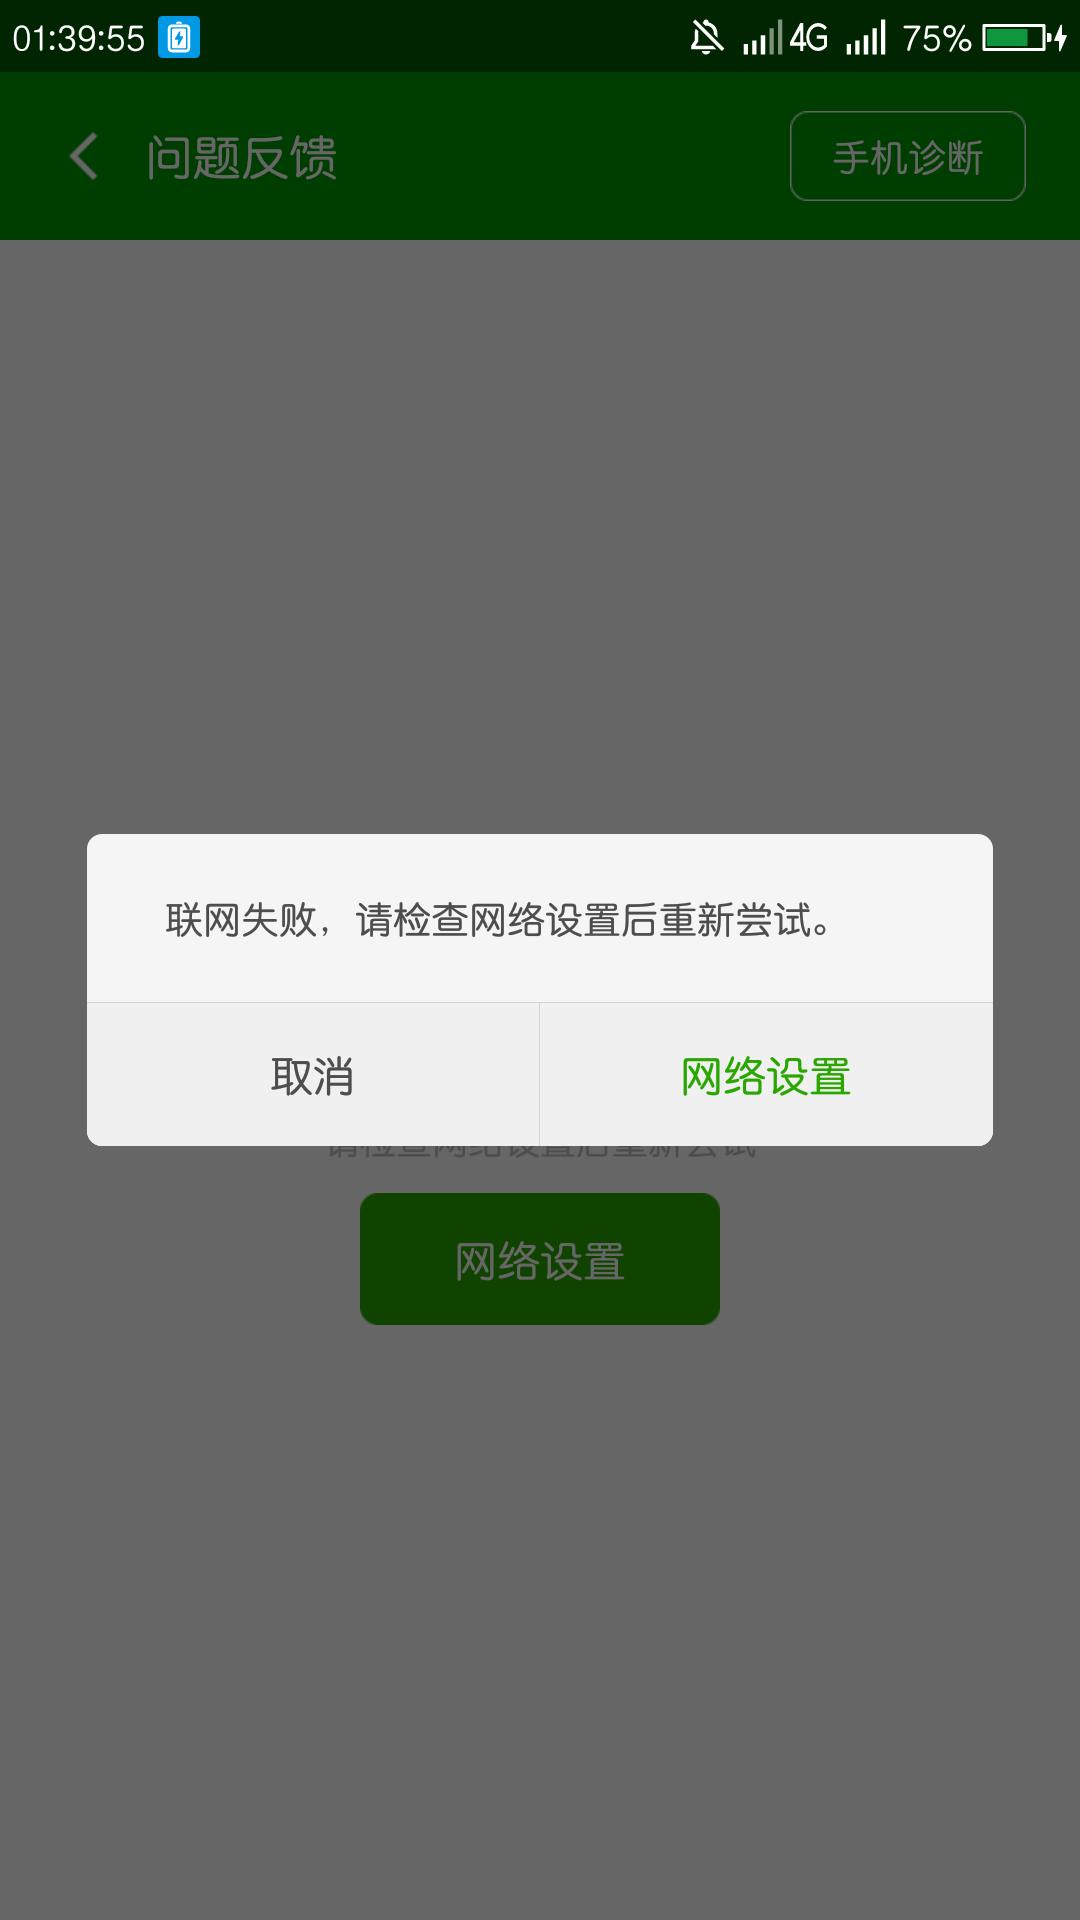 Screenshot_2017-09-20-01-39-56.png